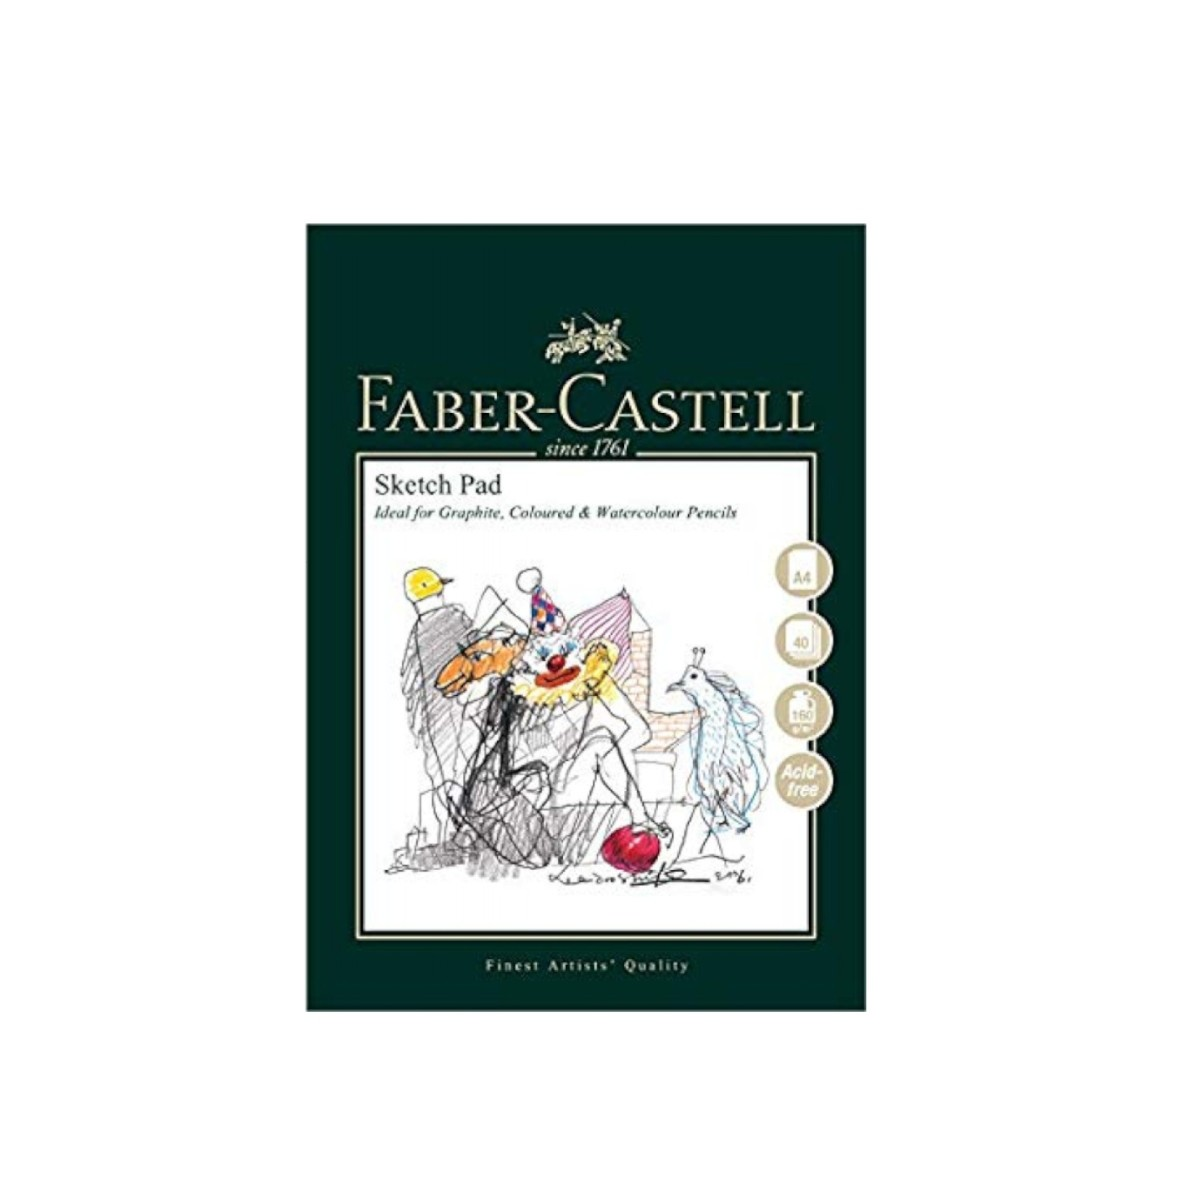 FaberCastellSketchPad160g40ark-01